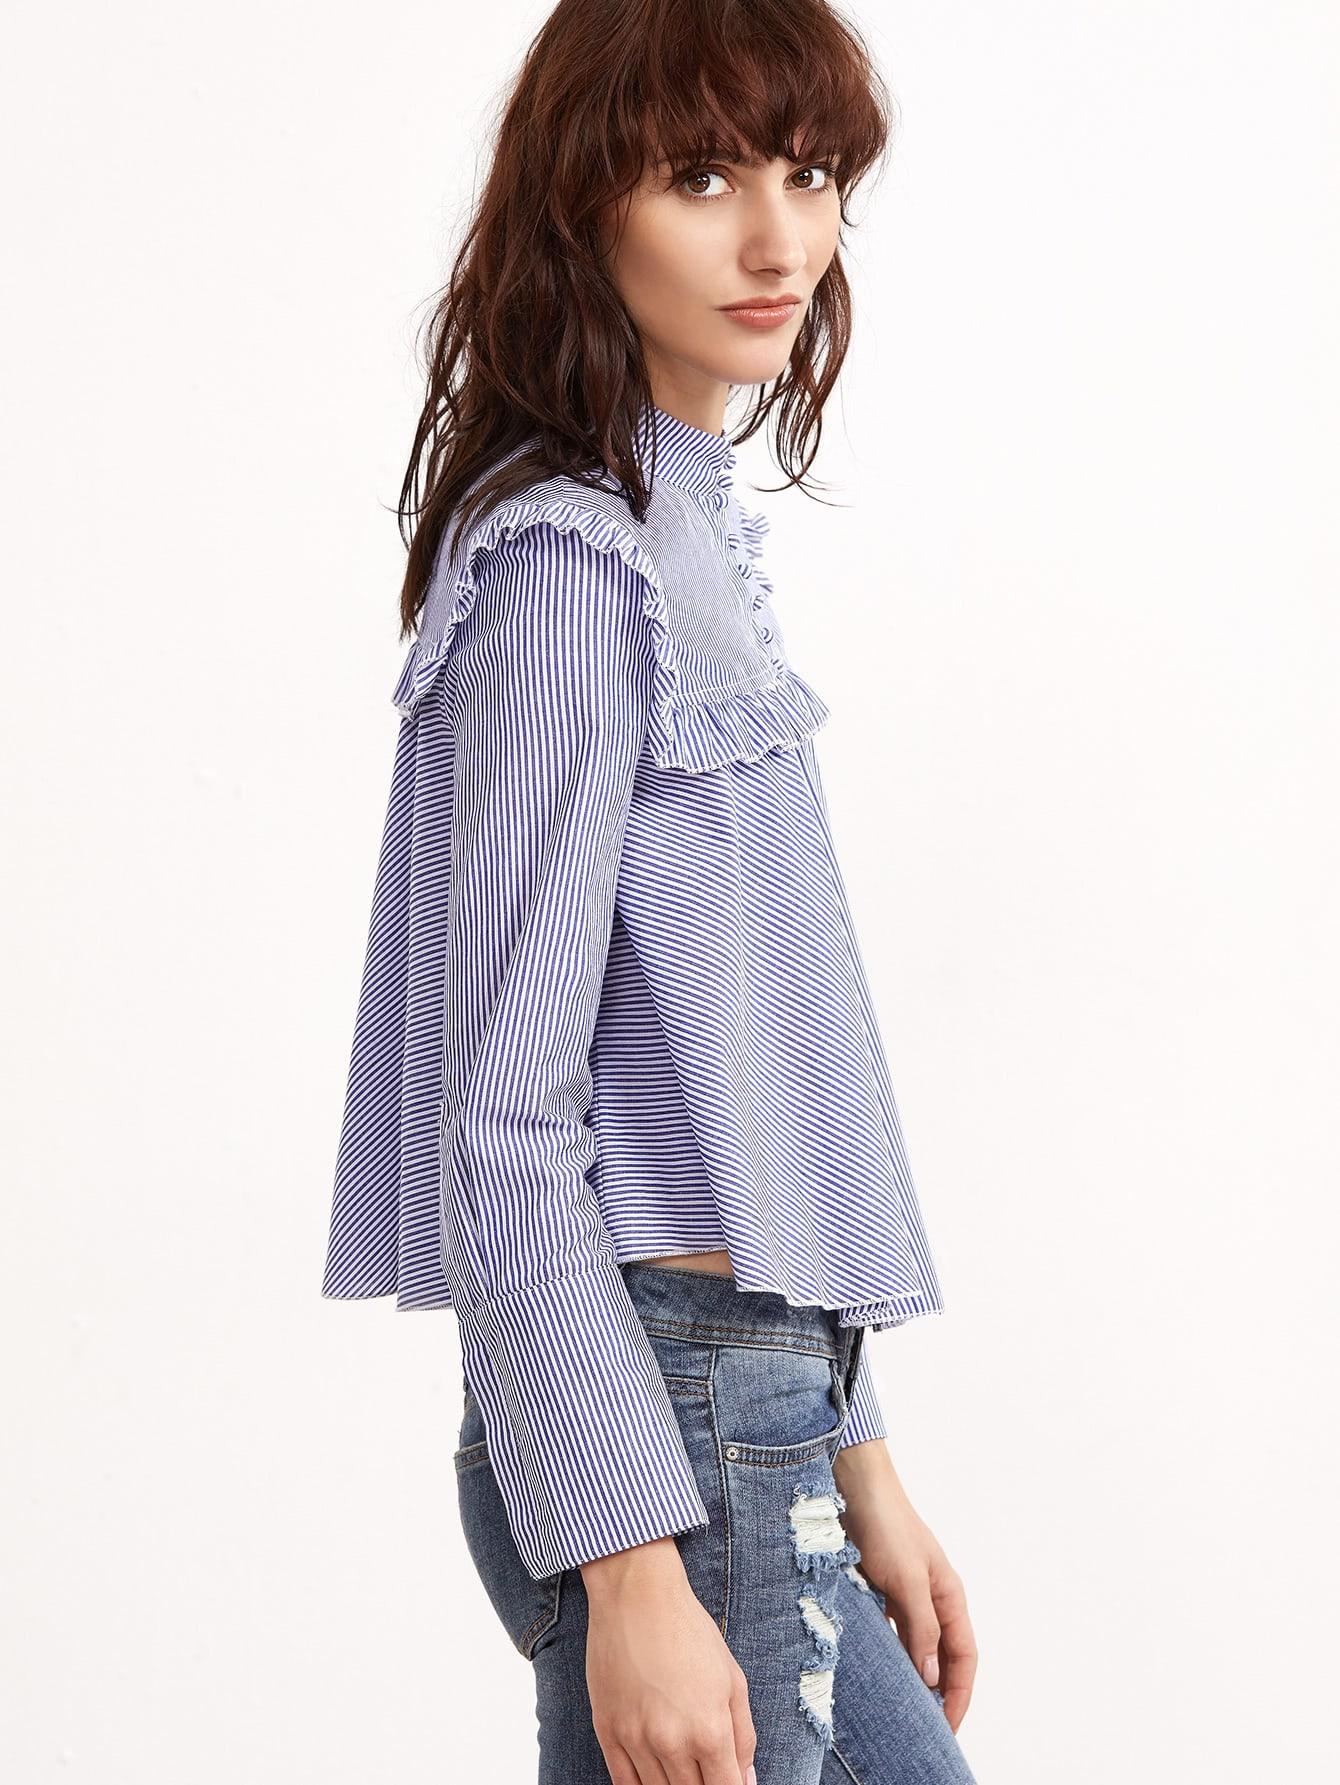 blouse161202711_2